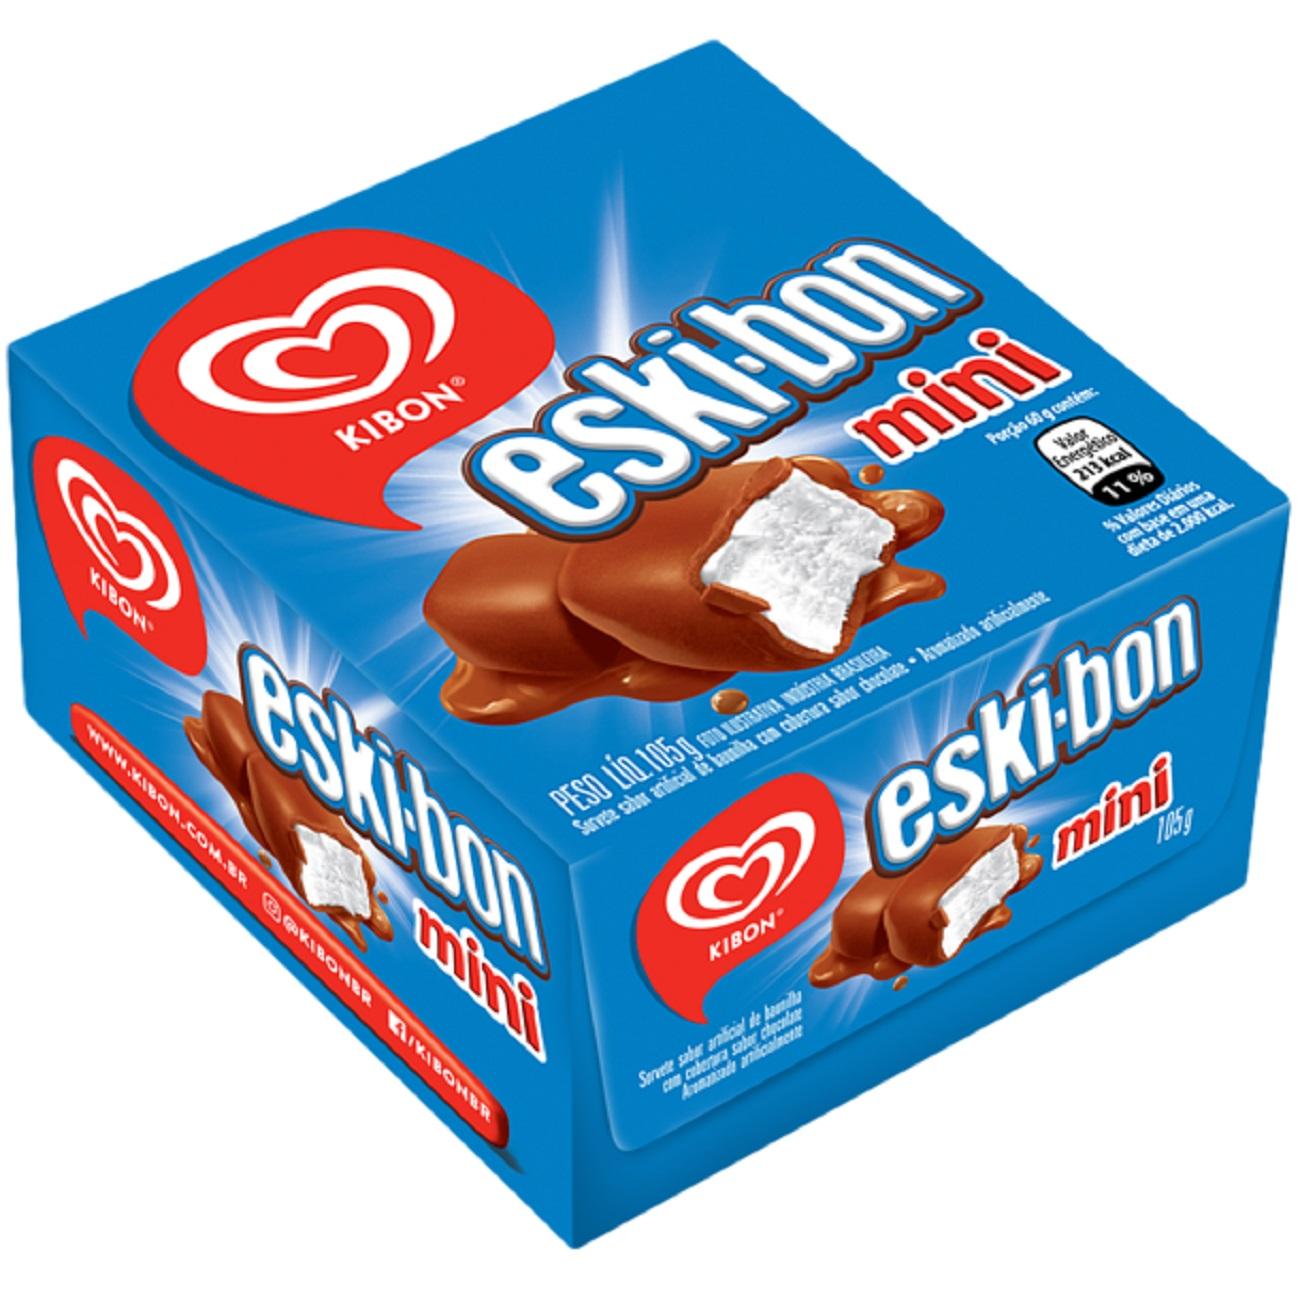 Sorvete Kibon Eskibon Mini Bombom Gelato Classico 92G | Caixa com 12